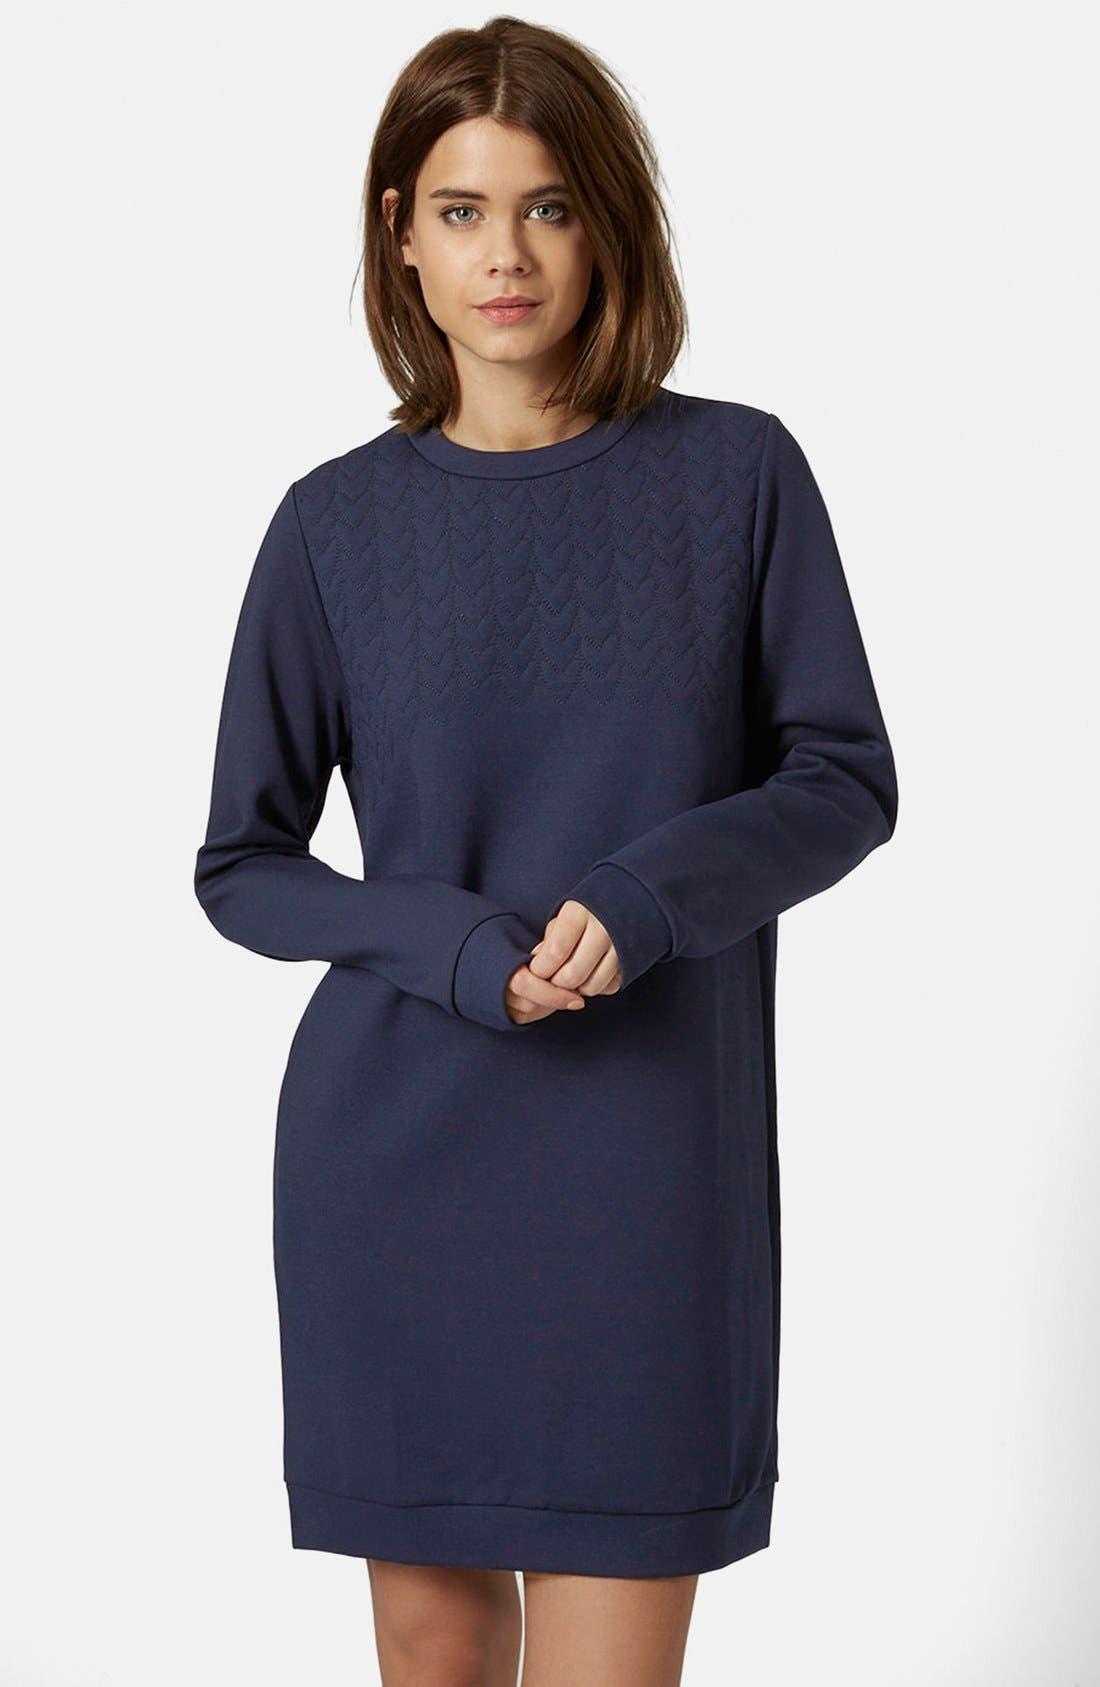 Alternate Image 1 Selected - Topshop Quilted Sweatshirt Dress